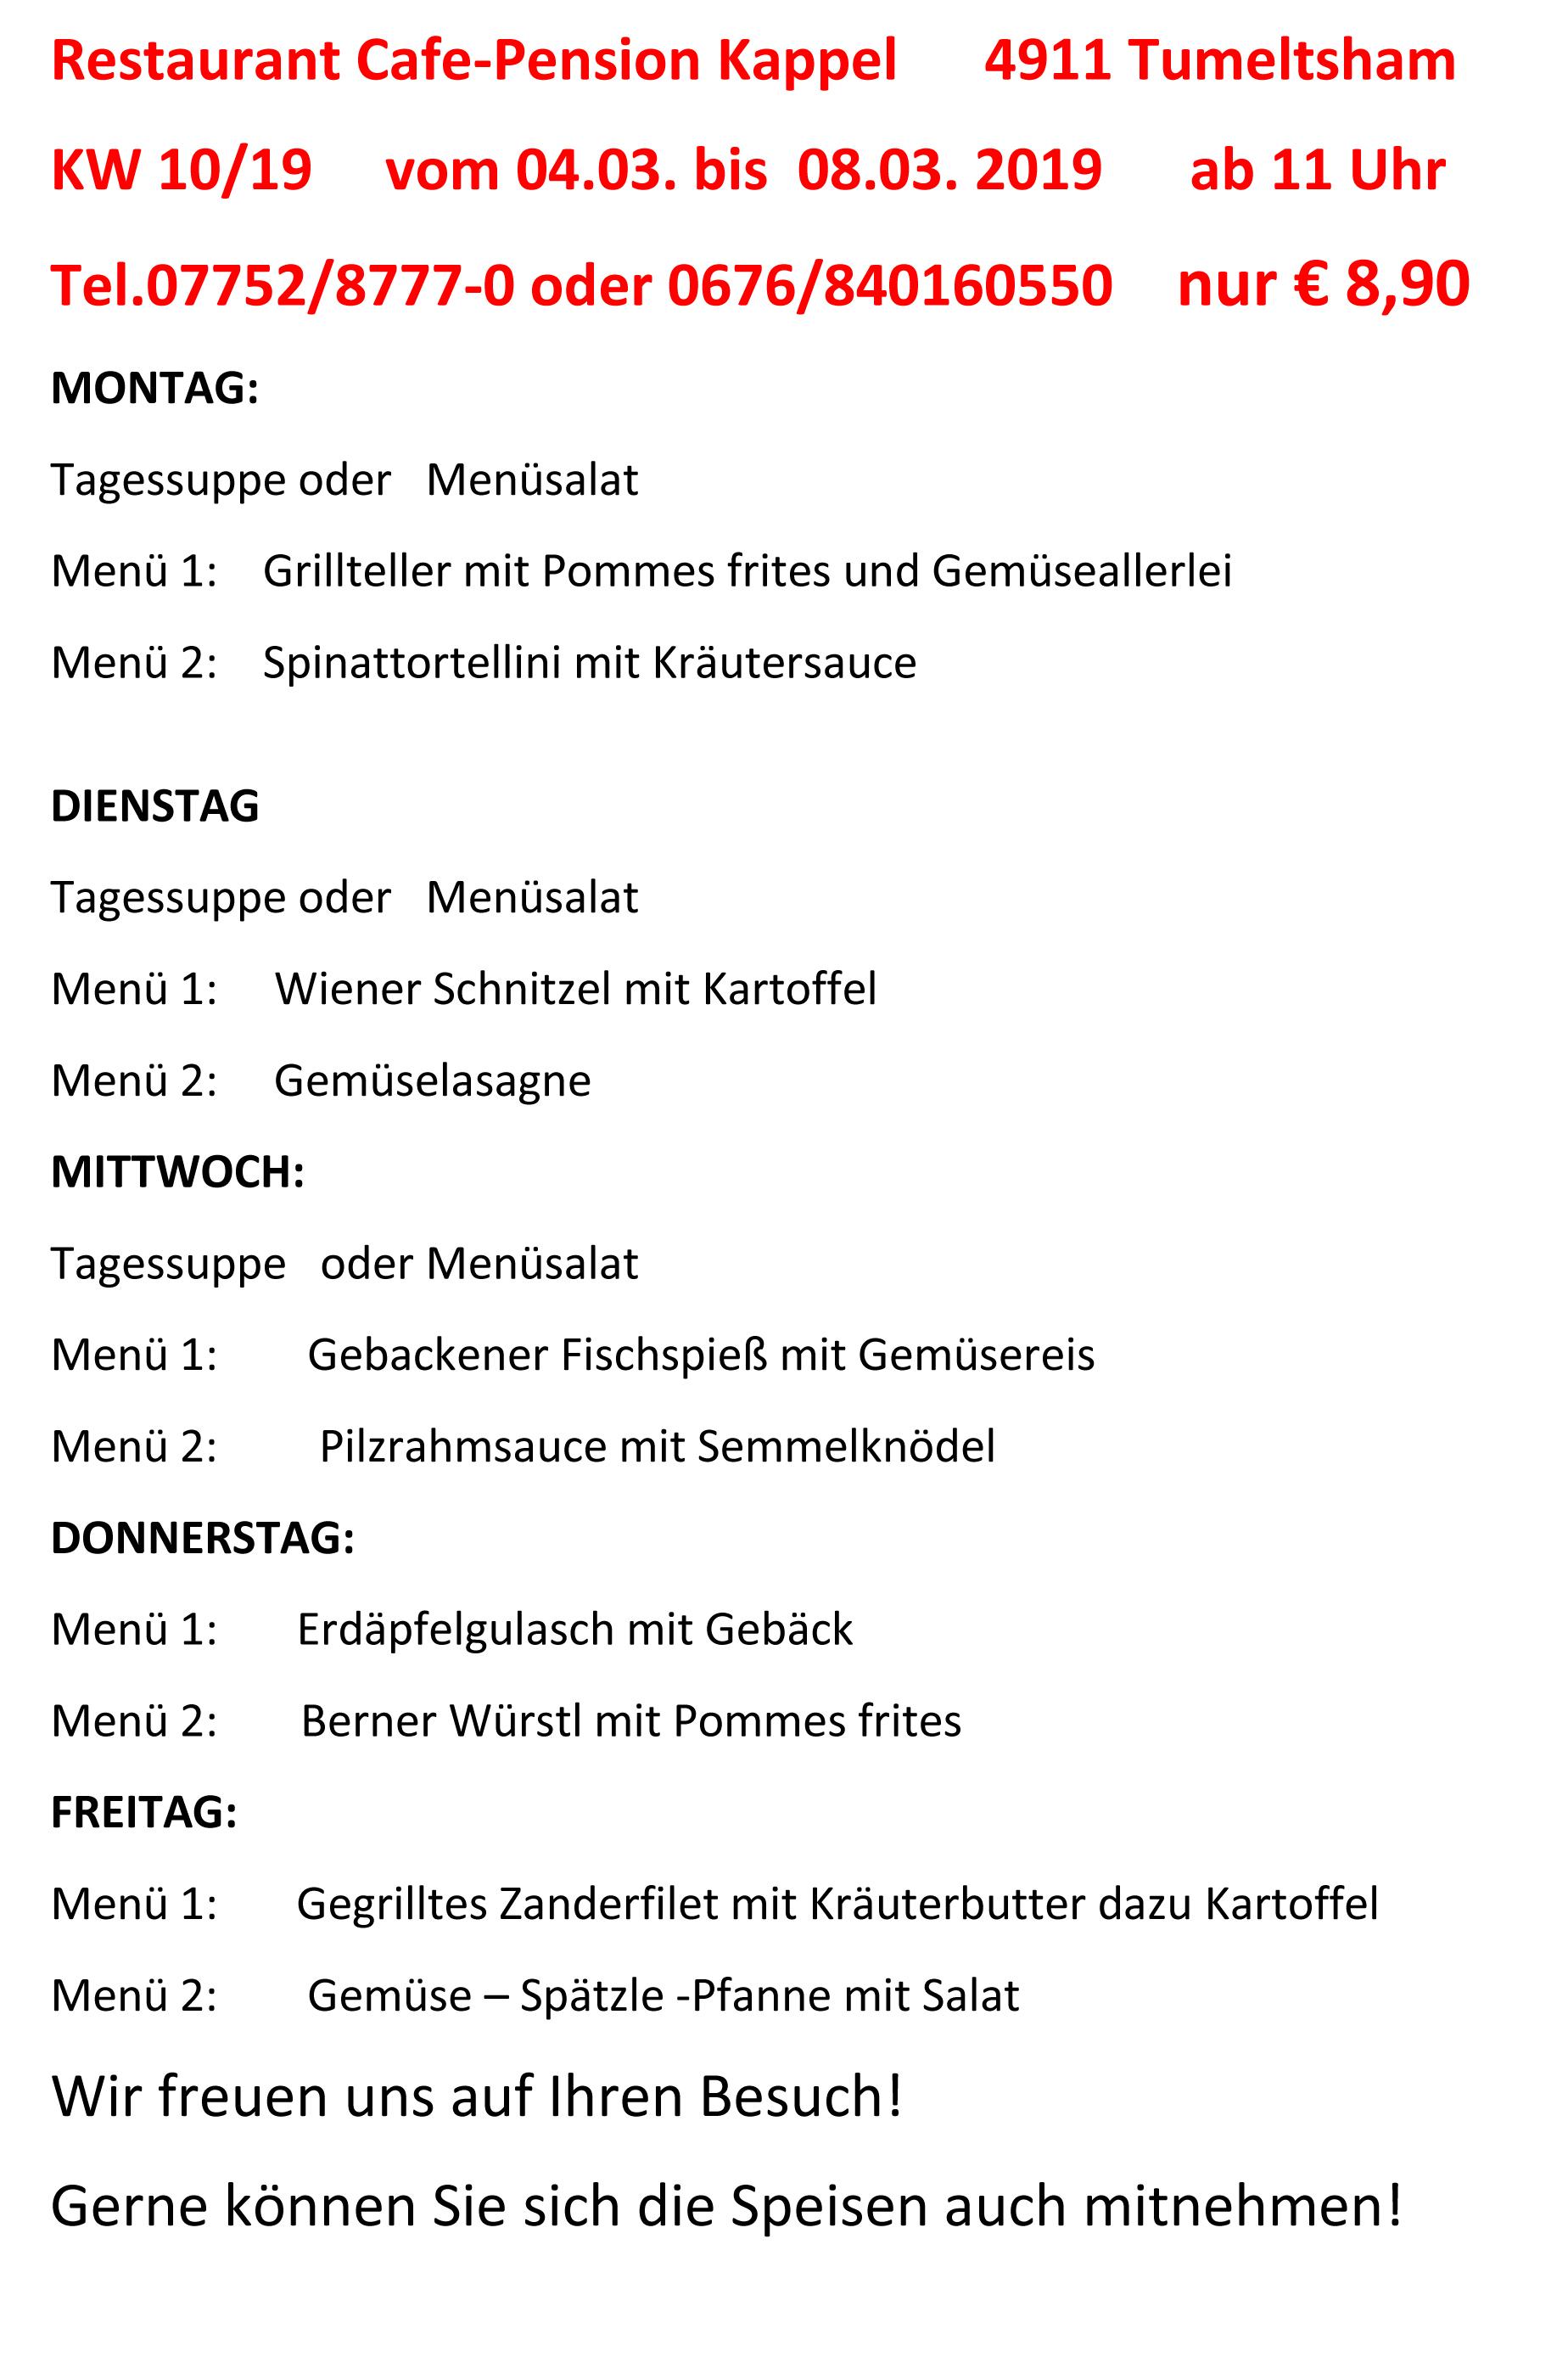 Menüplan KW 10- 19docx (3)